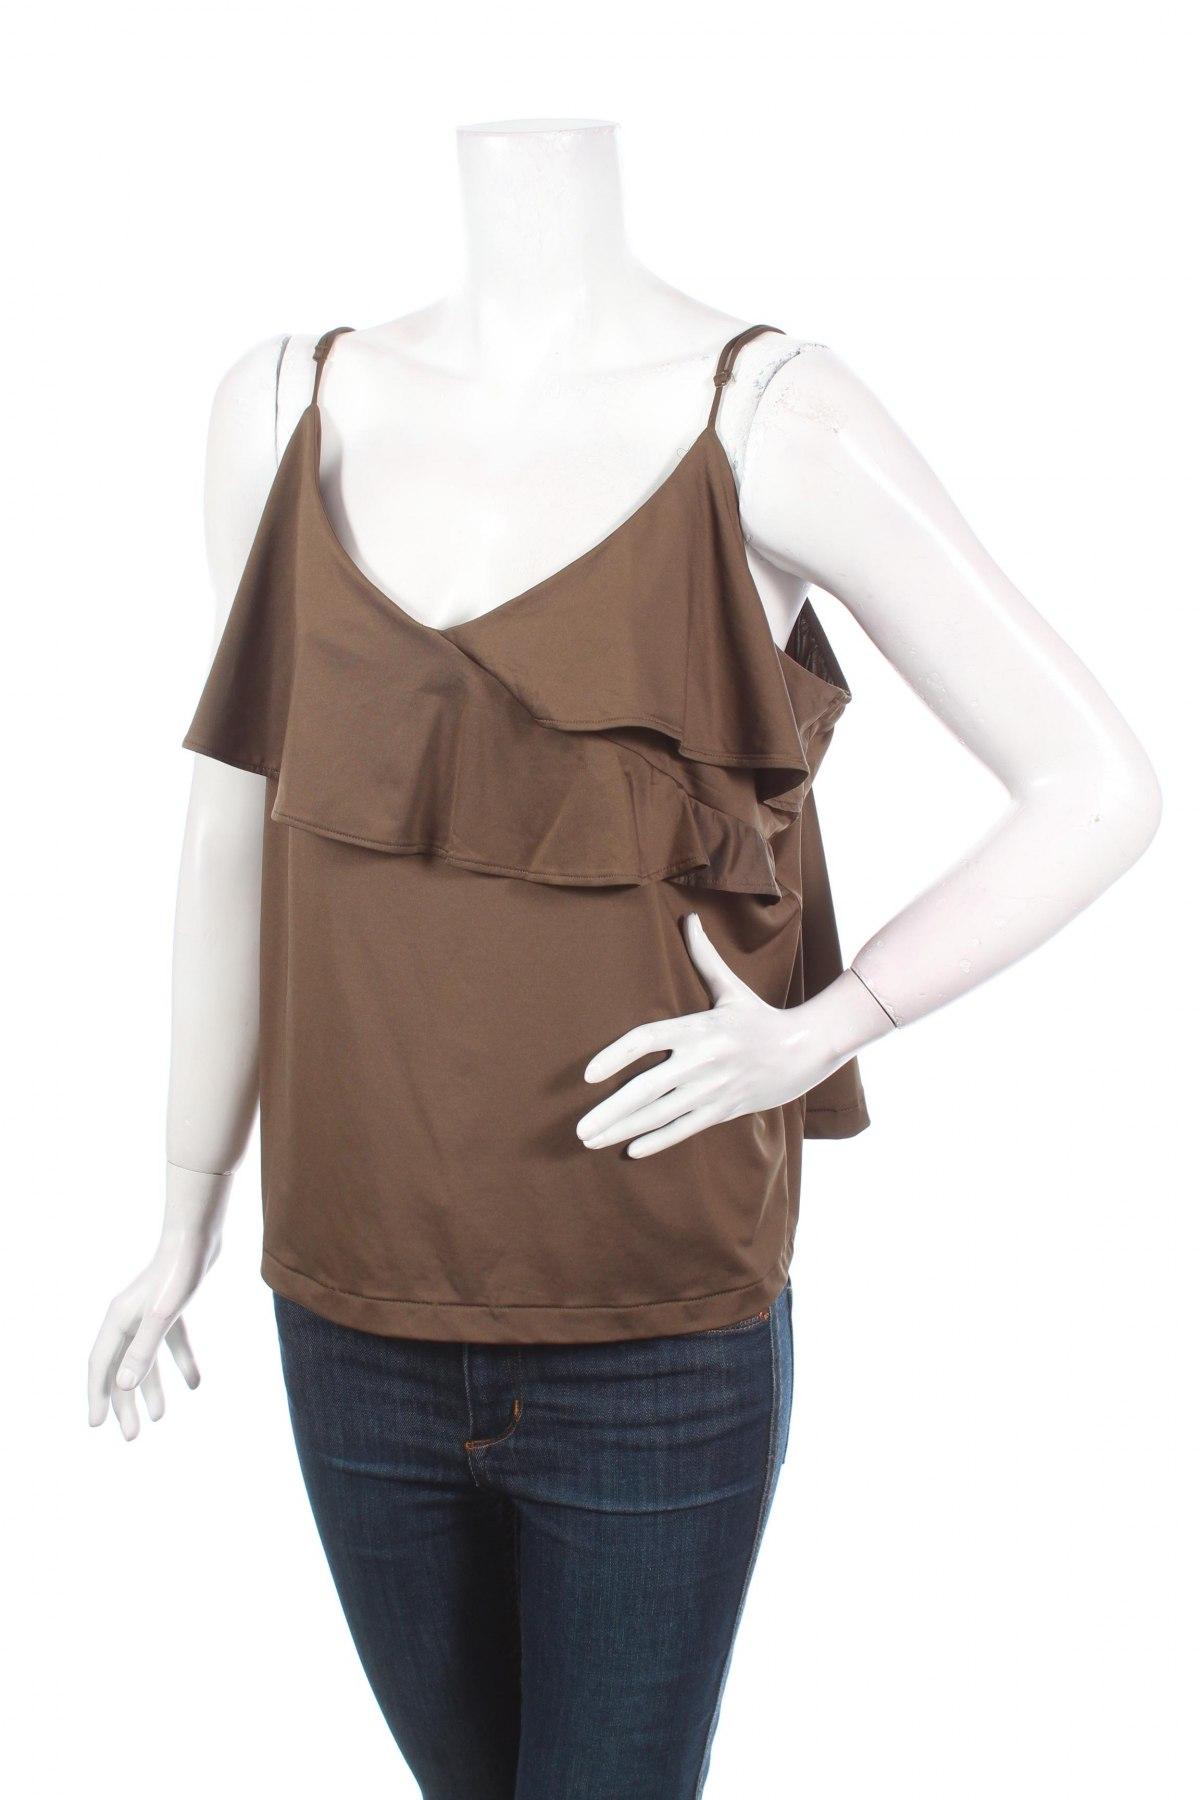 763339100fd Γυναικείο αμάνικο μπλουζάκι H&M - σε συμφέρουσα τιμή στο Remix ...